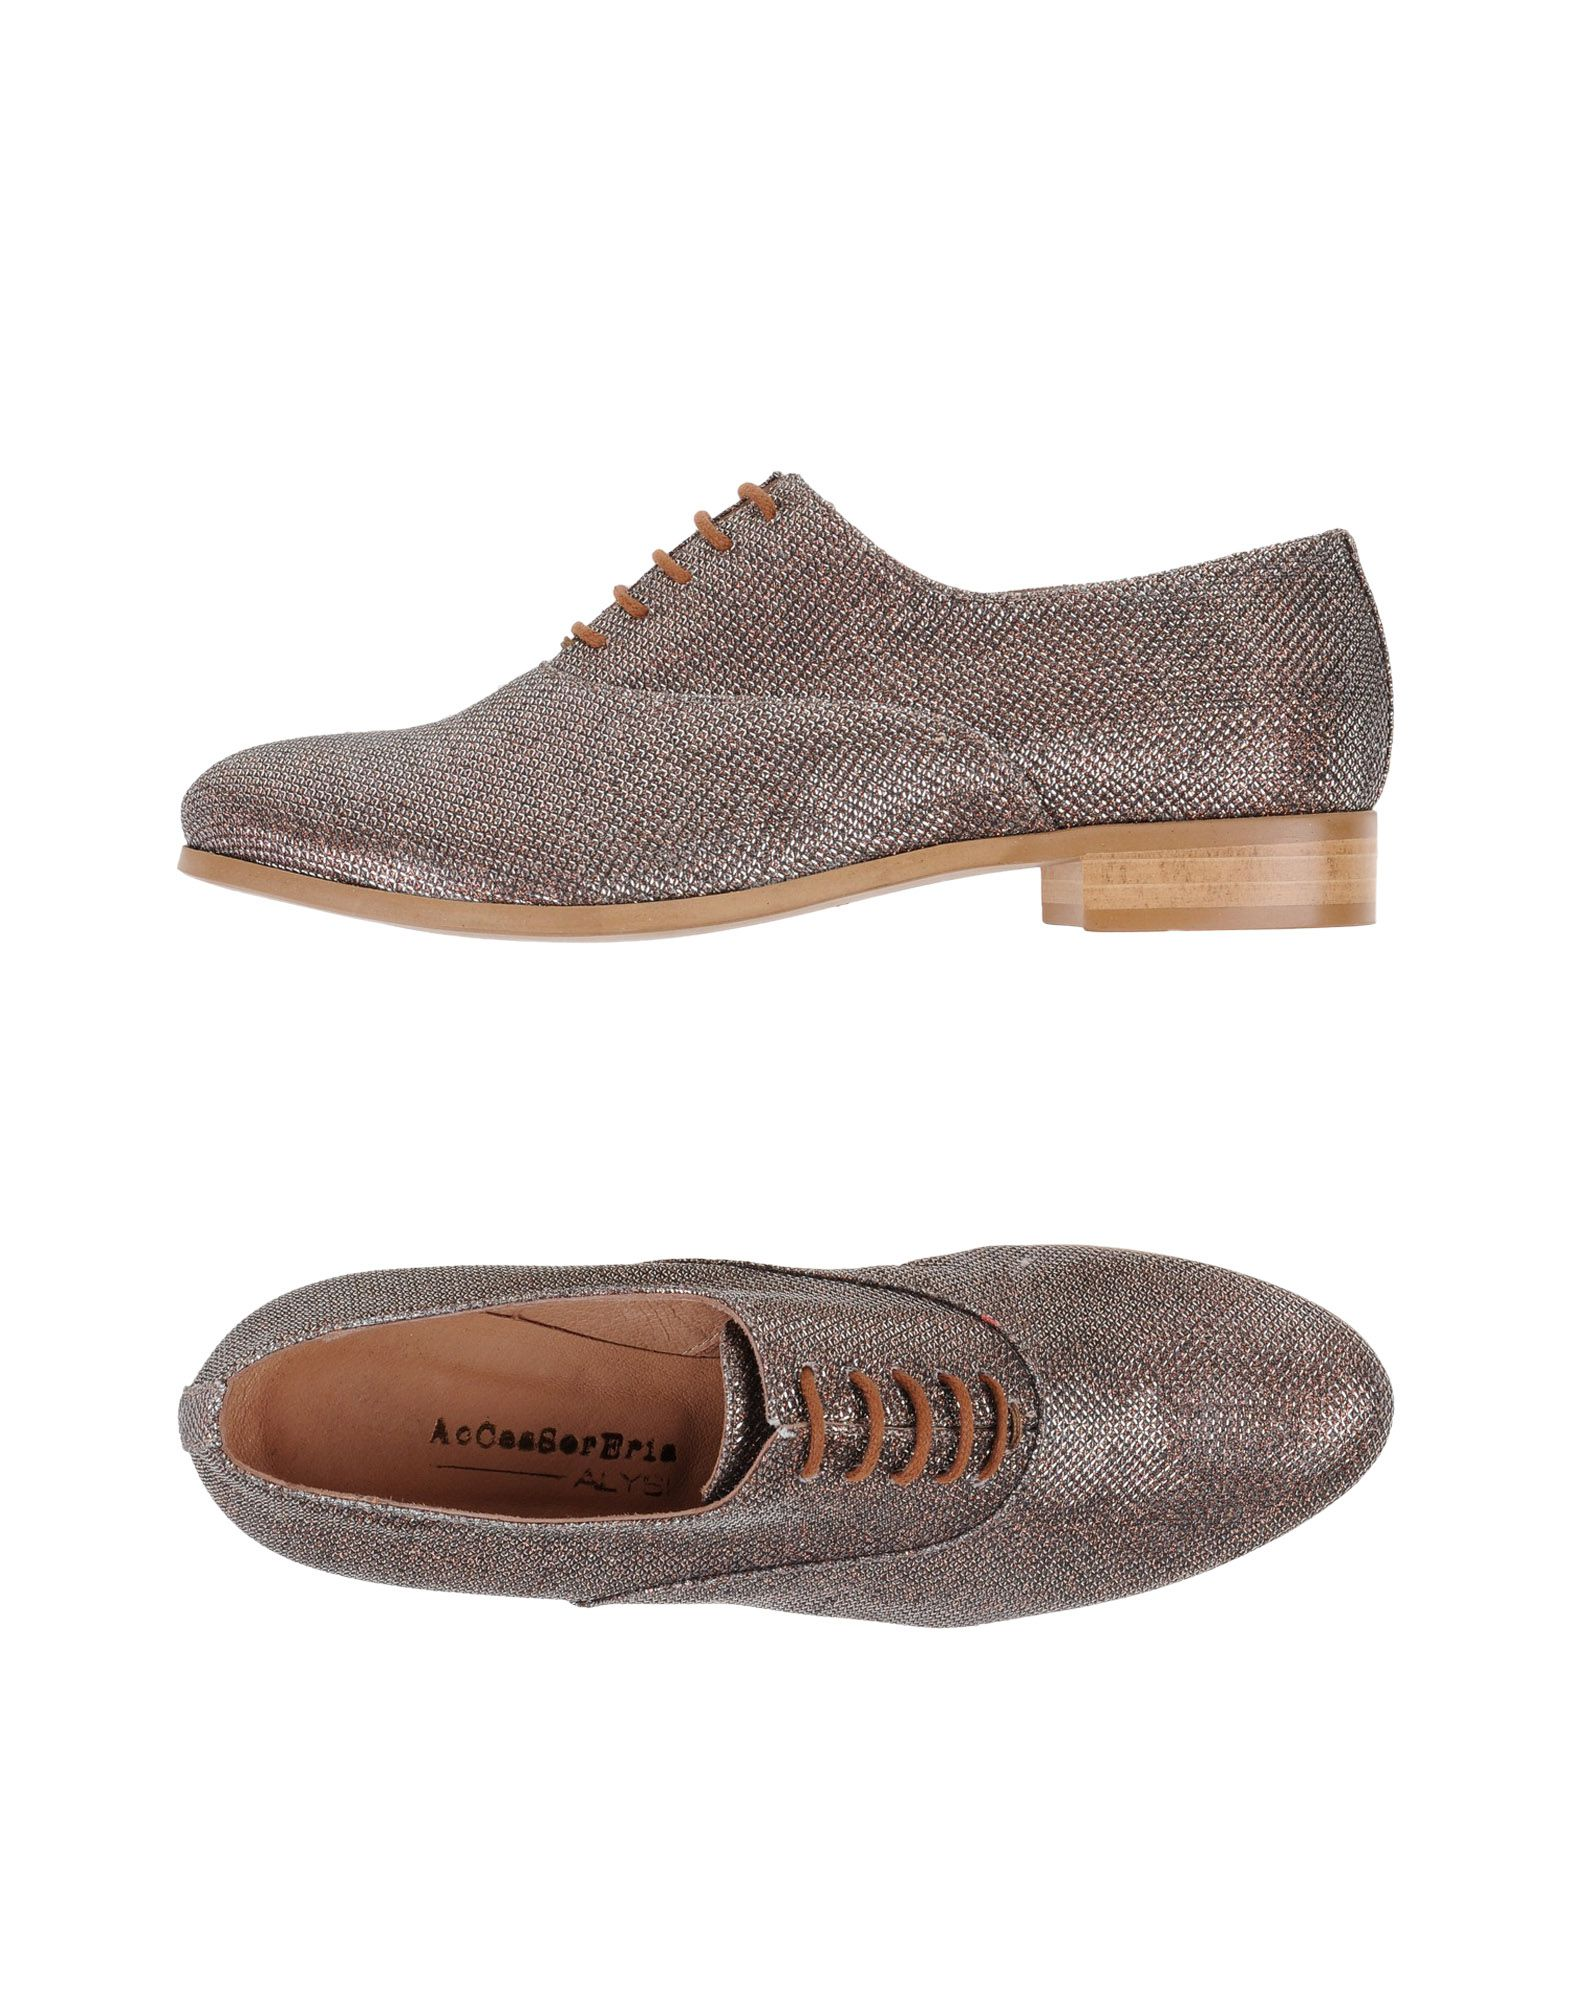 ALYSI Обувь на шнурках первый внутри обувь обувь обувь обувь обувь обувь обувь обувь обувь 8a2549 мужская армия green 40 метров